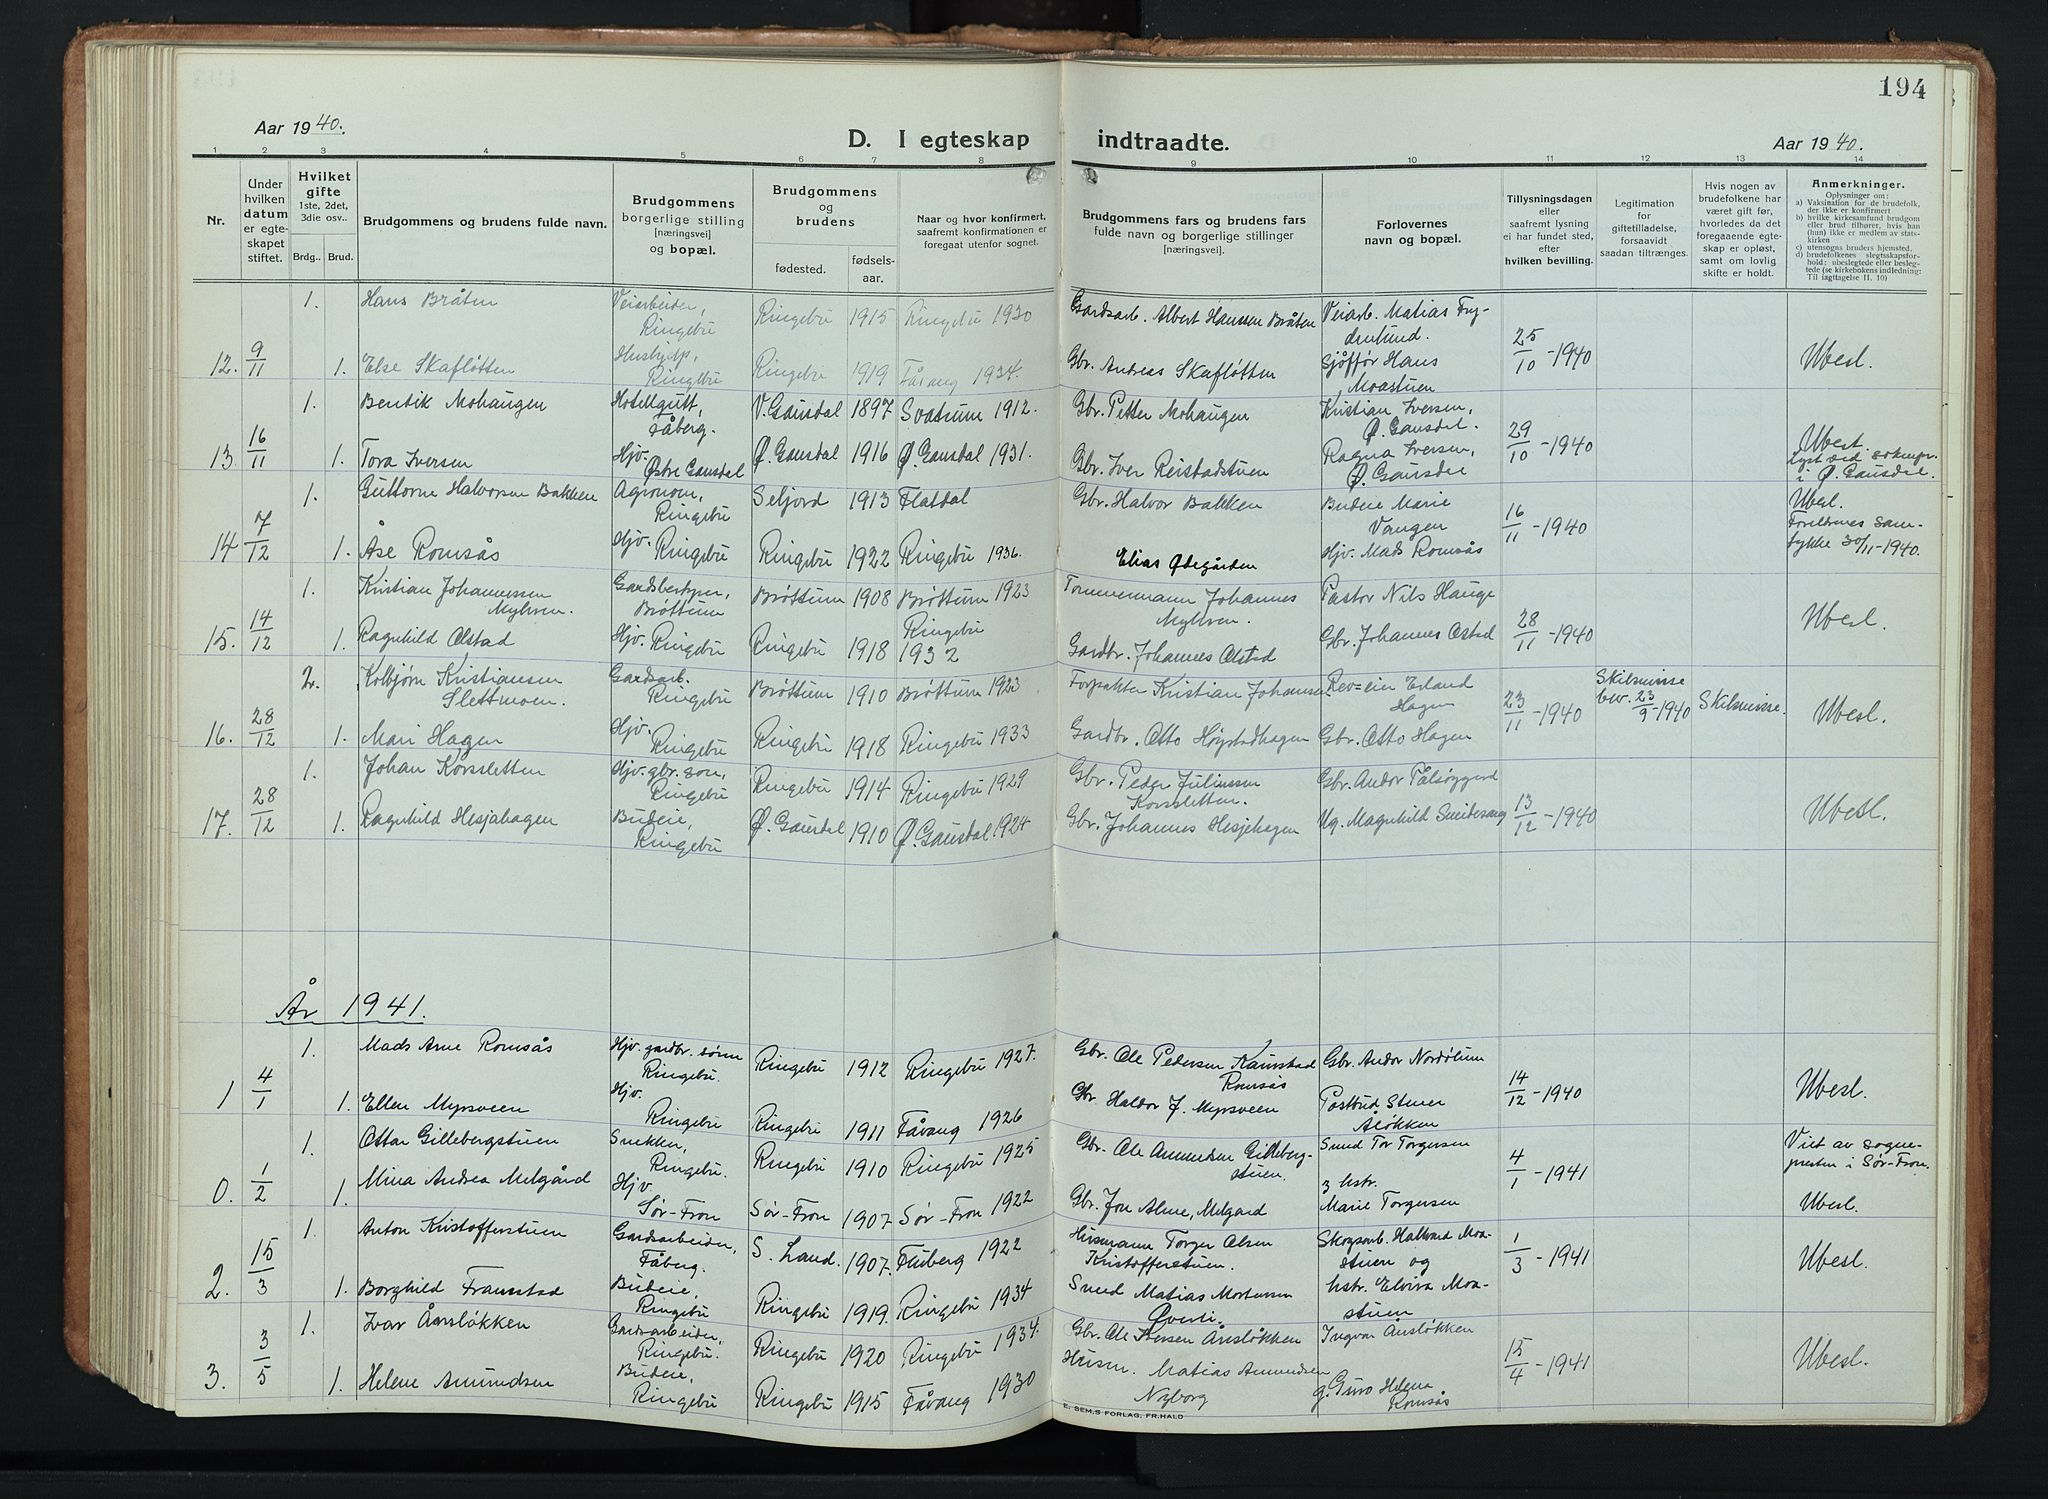 SAH, Ringebu prestekontor, Klokkerbok nr. 11, 1921-1943, s. 194